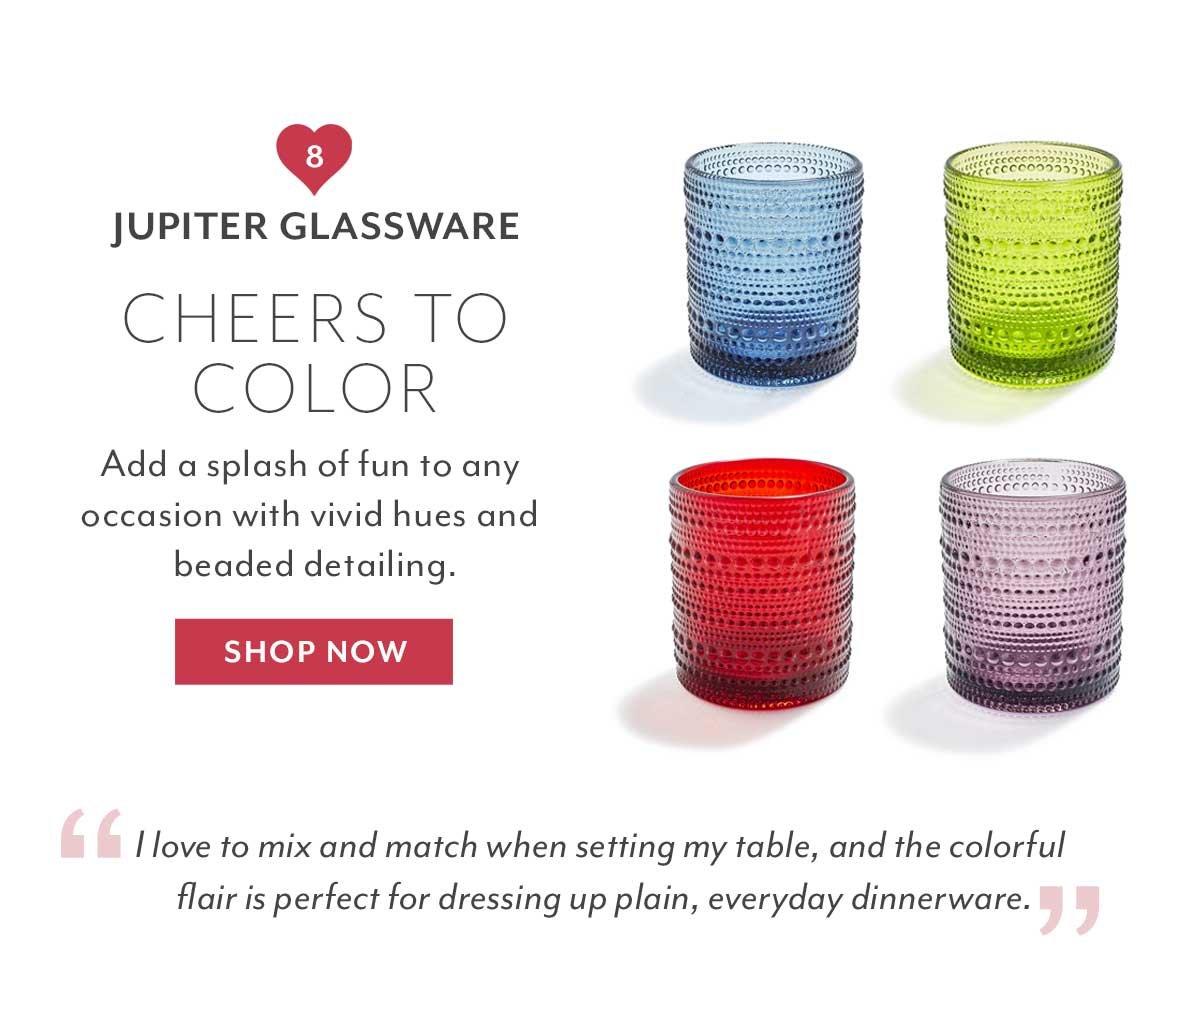 Jupiter Glassware